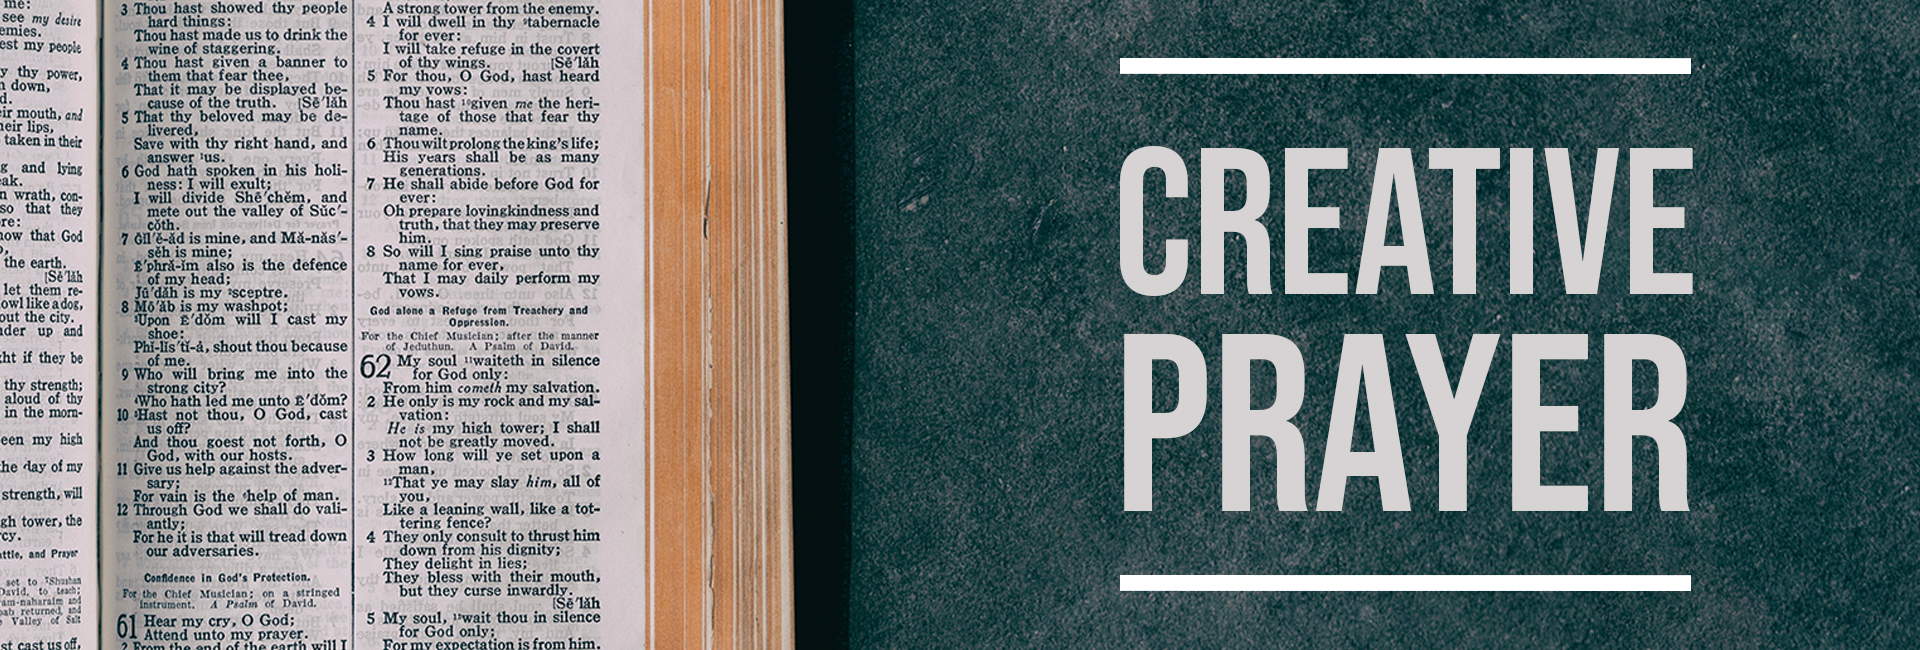 Creative Prayers Web